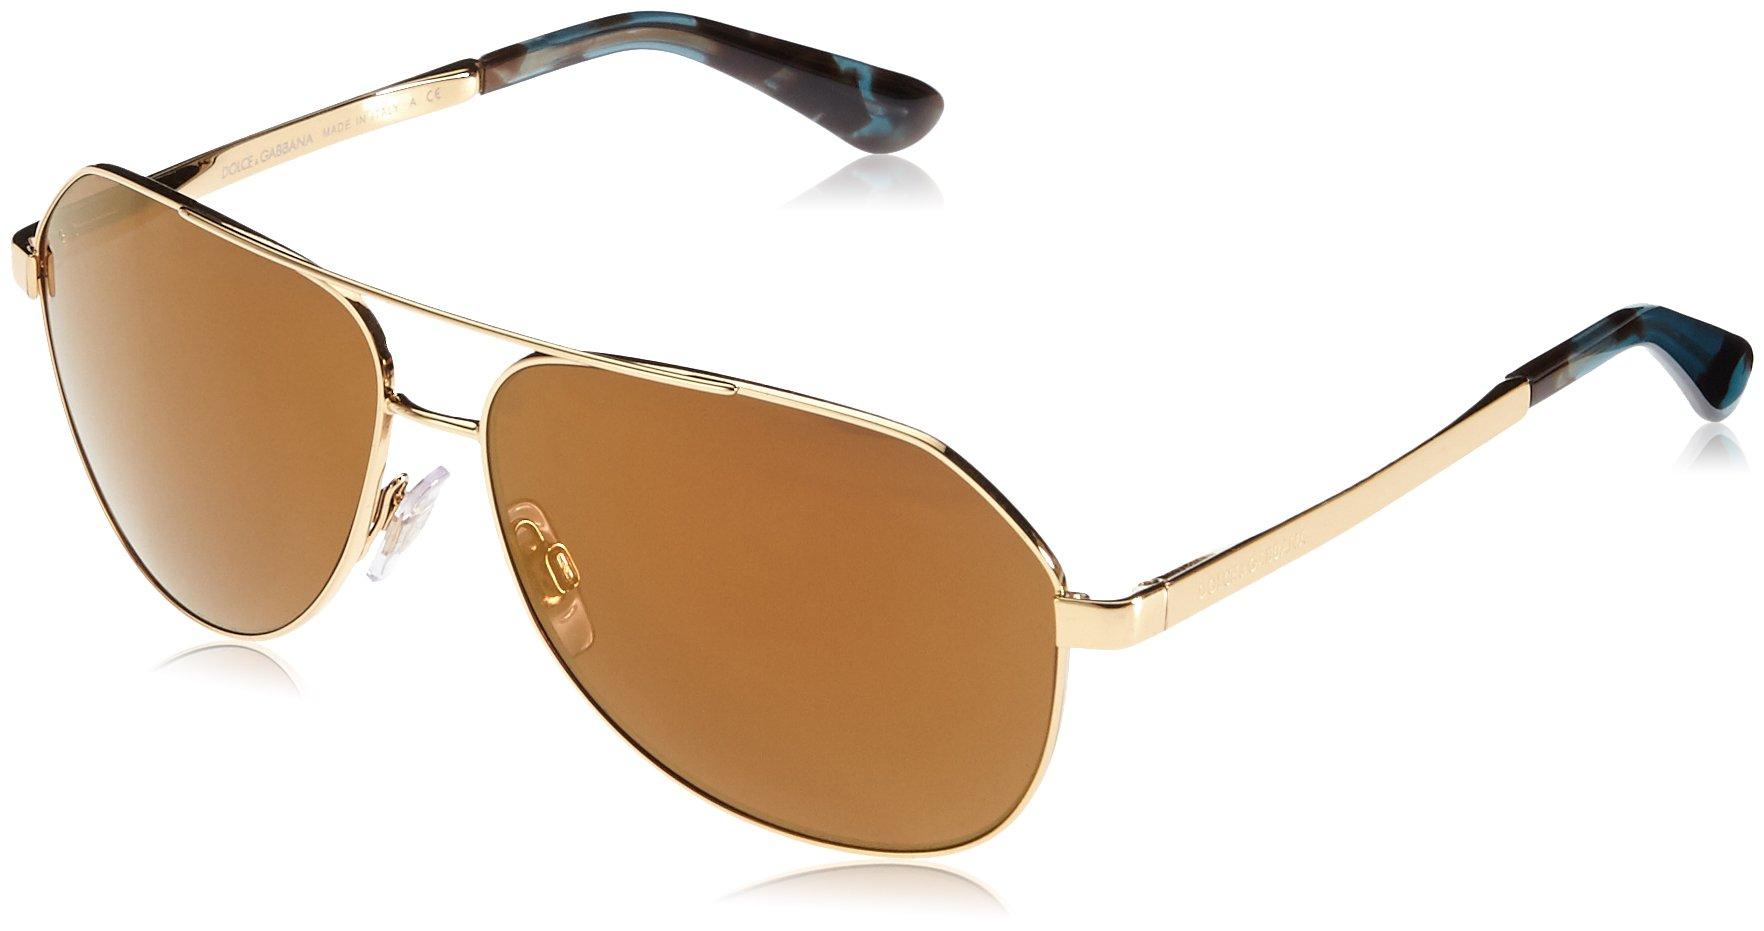 Dolce & Gabbana Women's Sicilian Taste Aviator Sunglasses, Gold, 59 mm